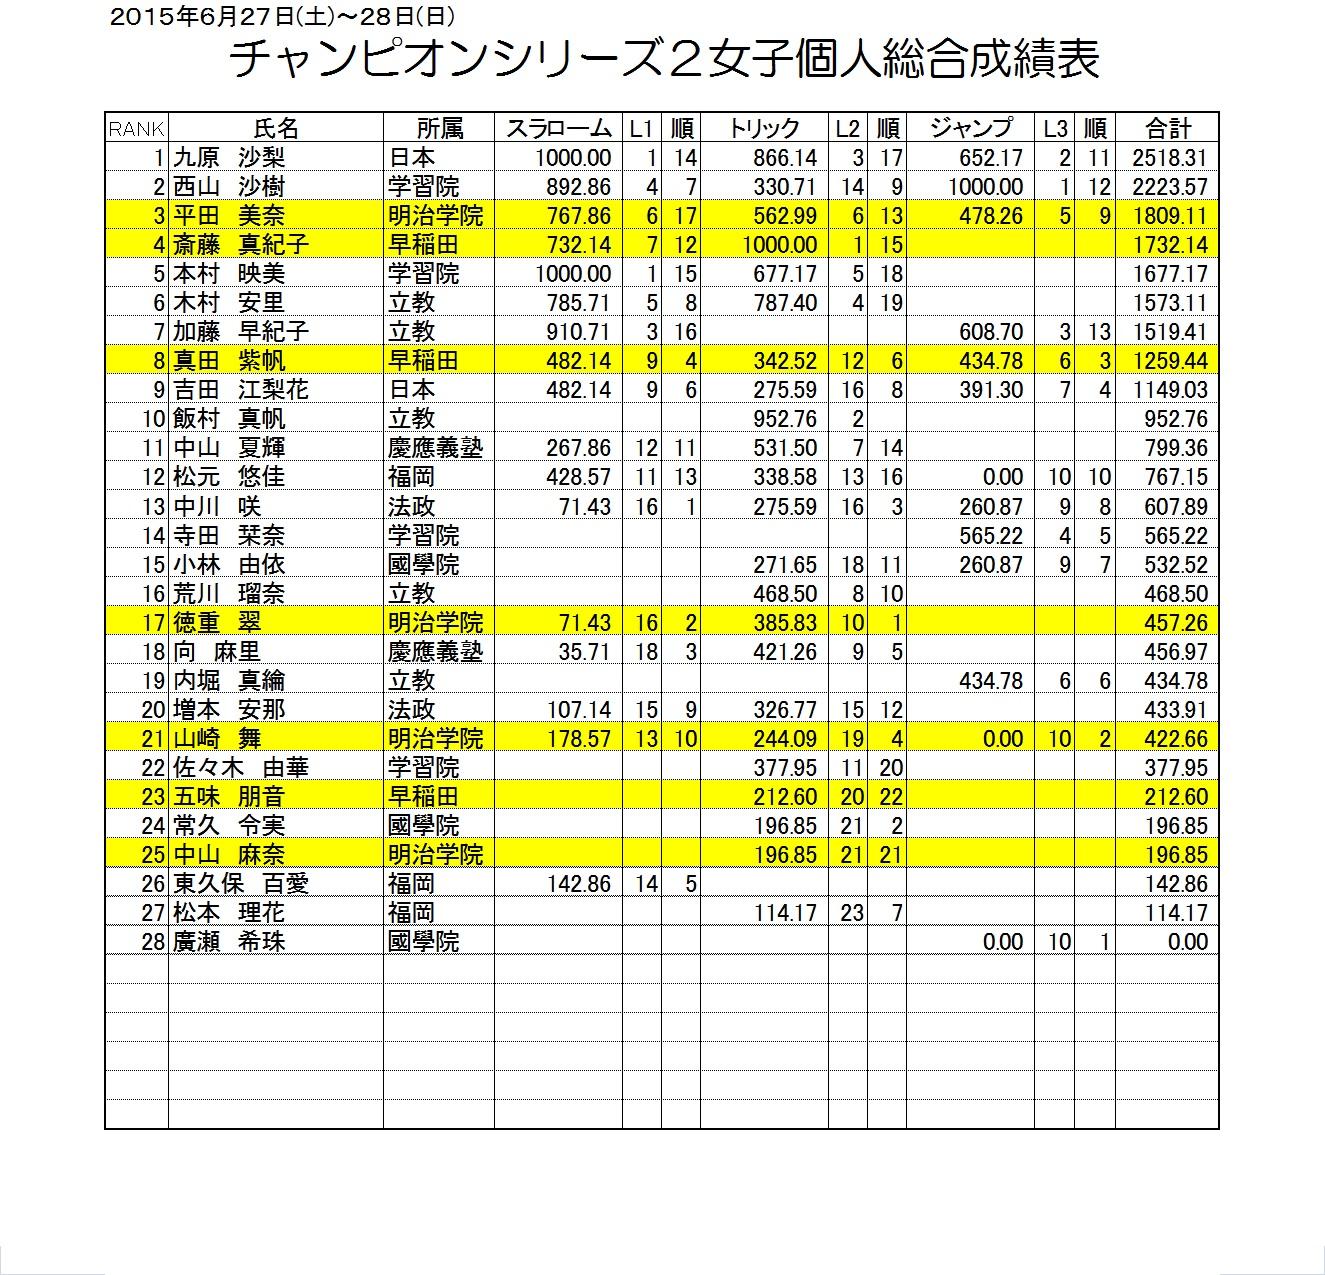 2015 CS2大会女子個人総合成績